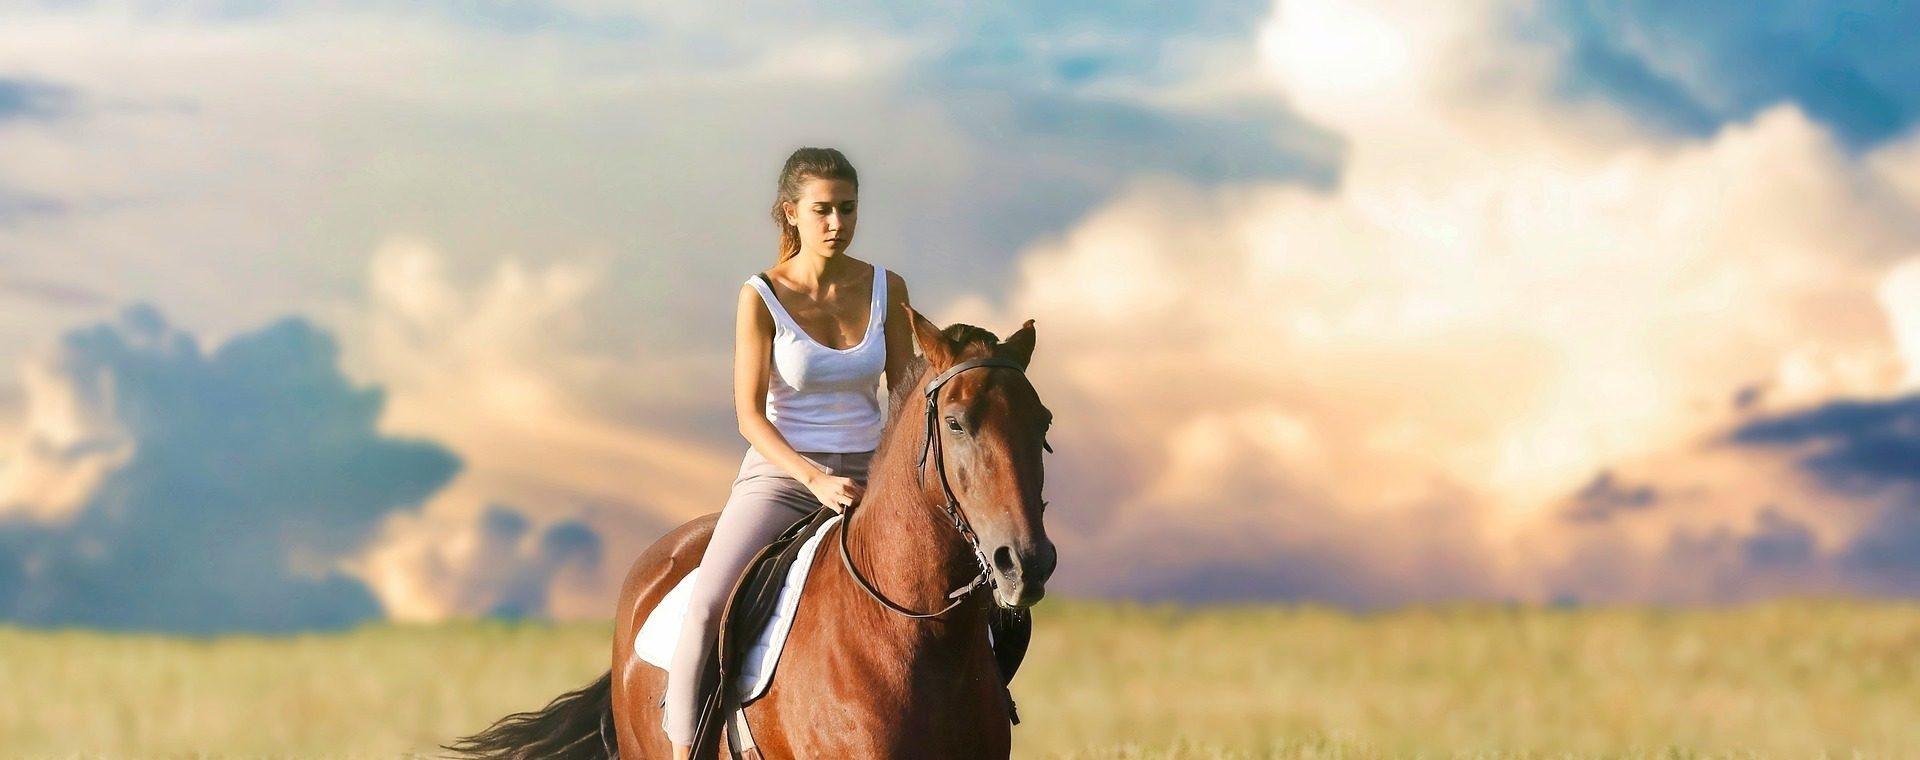 Stadnina koni Rajd, Jaworki